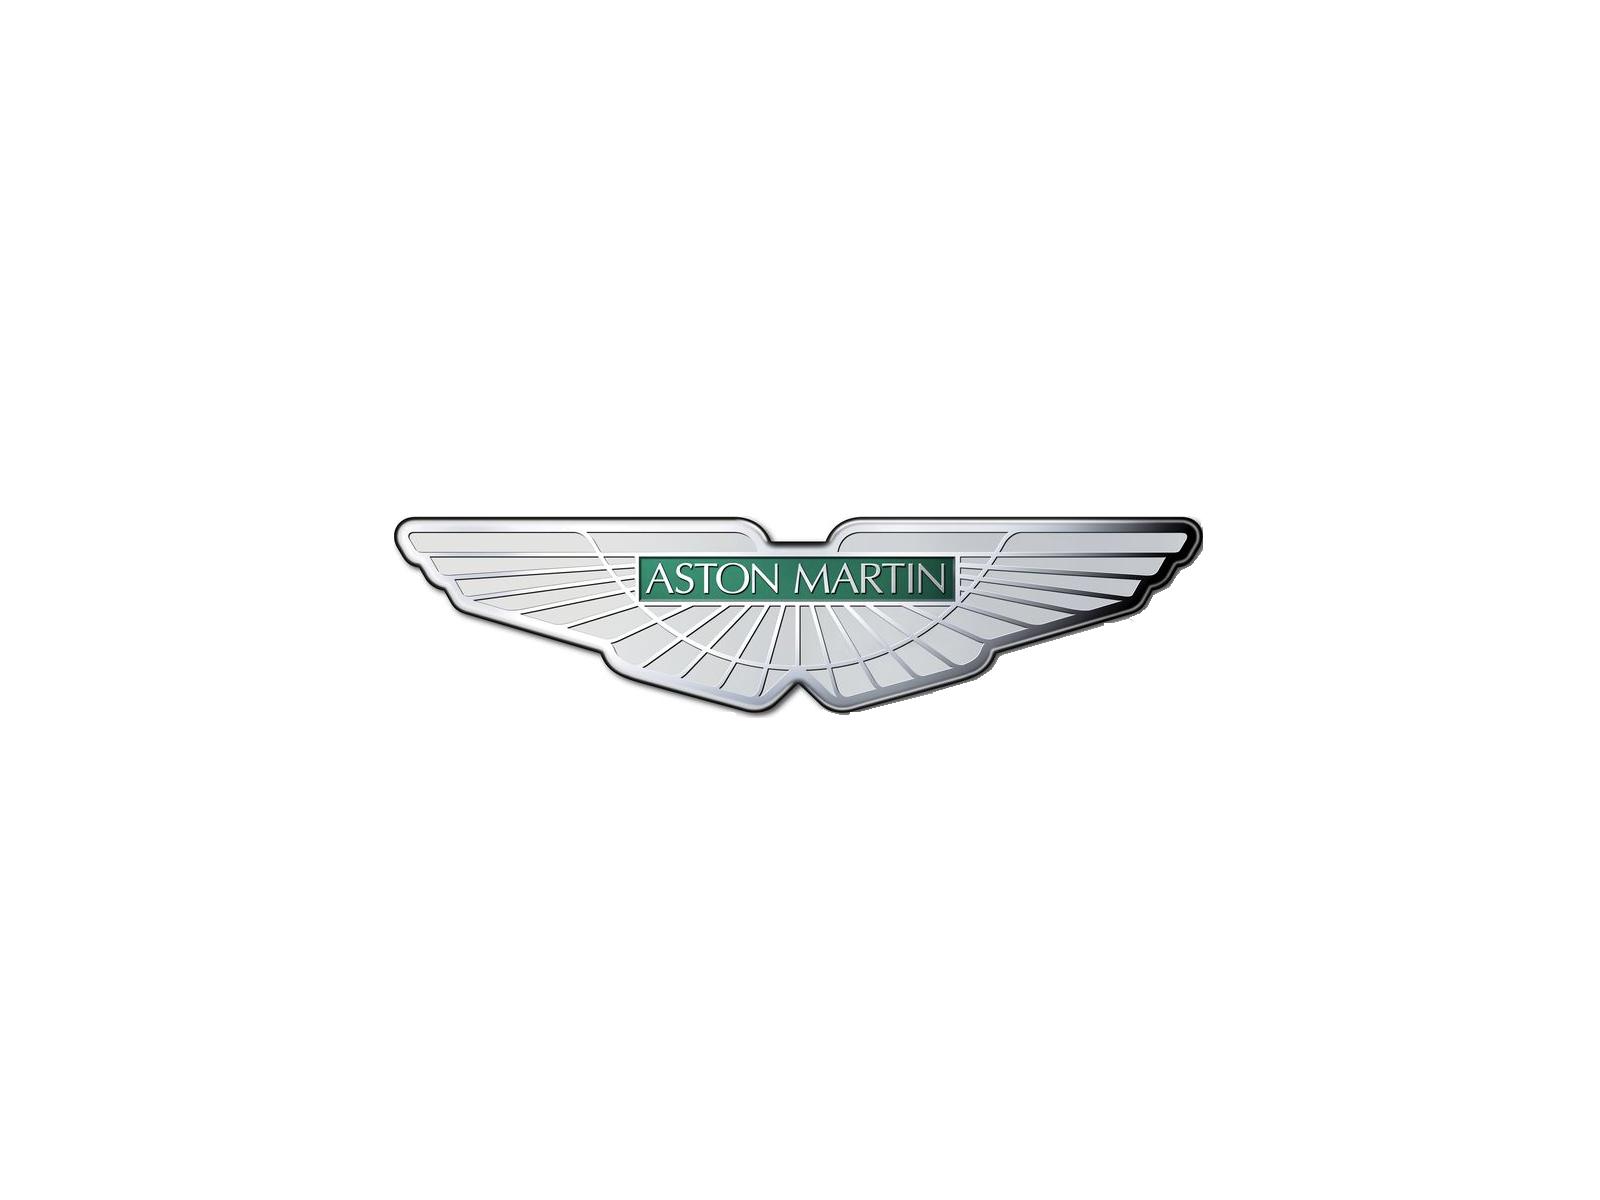 Aston Martin логотип PNG